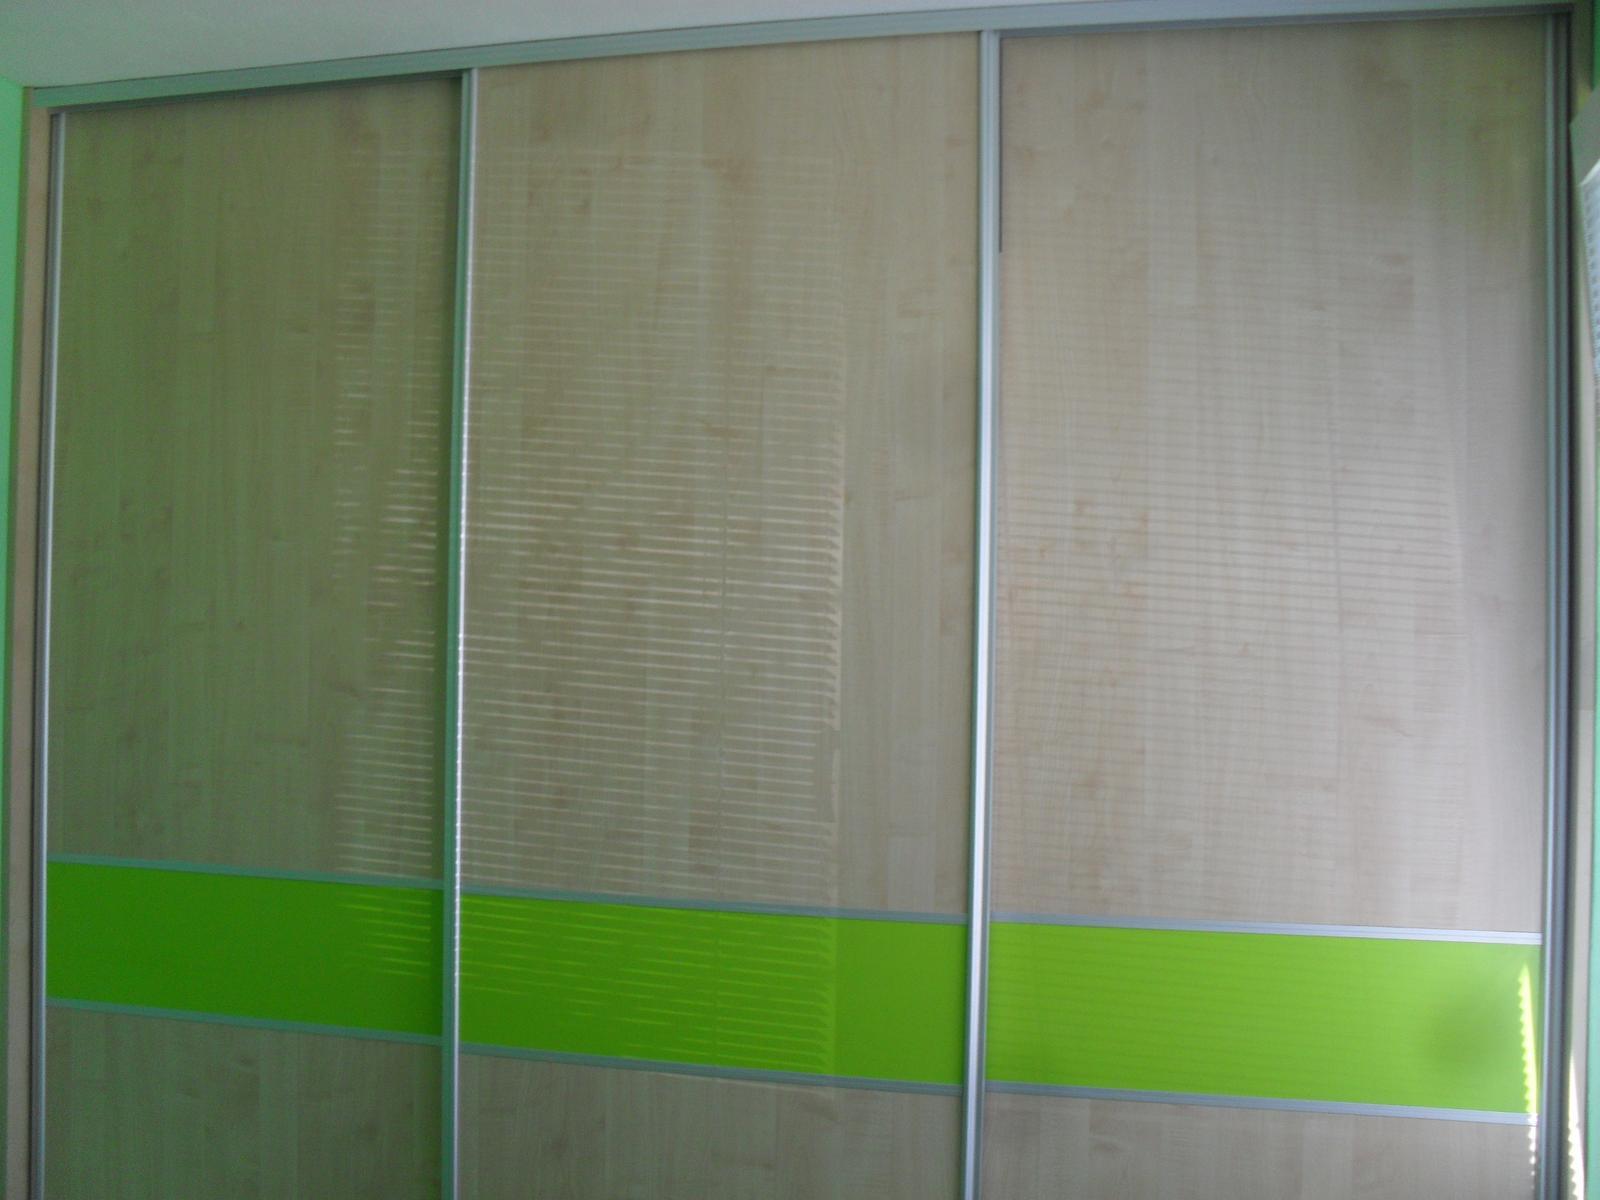 Vstavané skrine Martin Benko Bošany - Obrázok č. 89